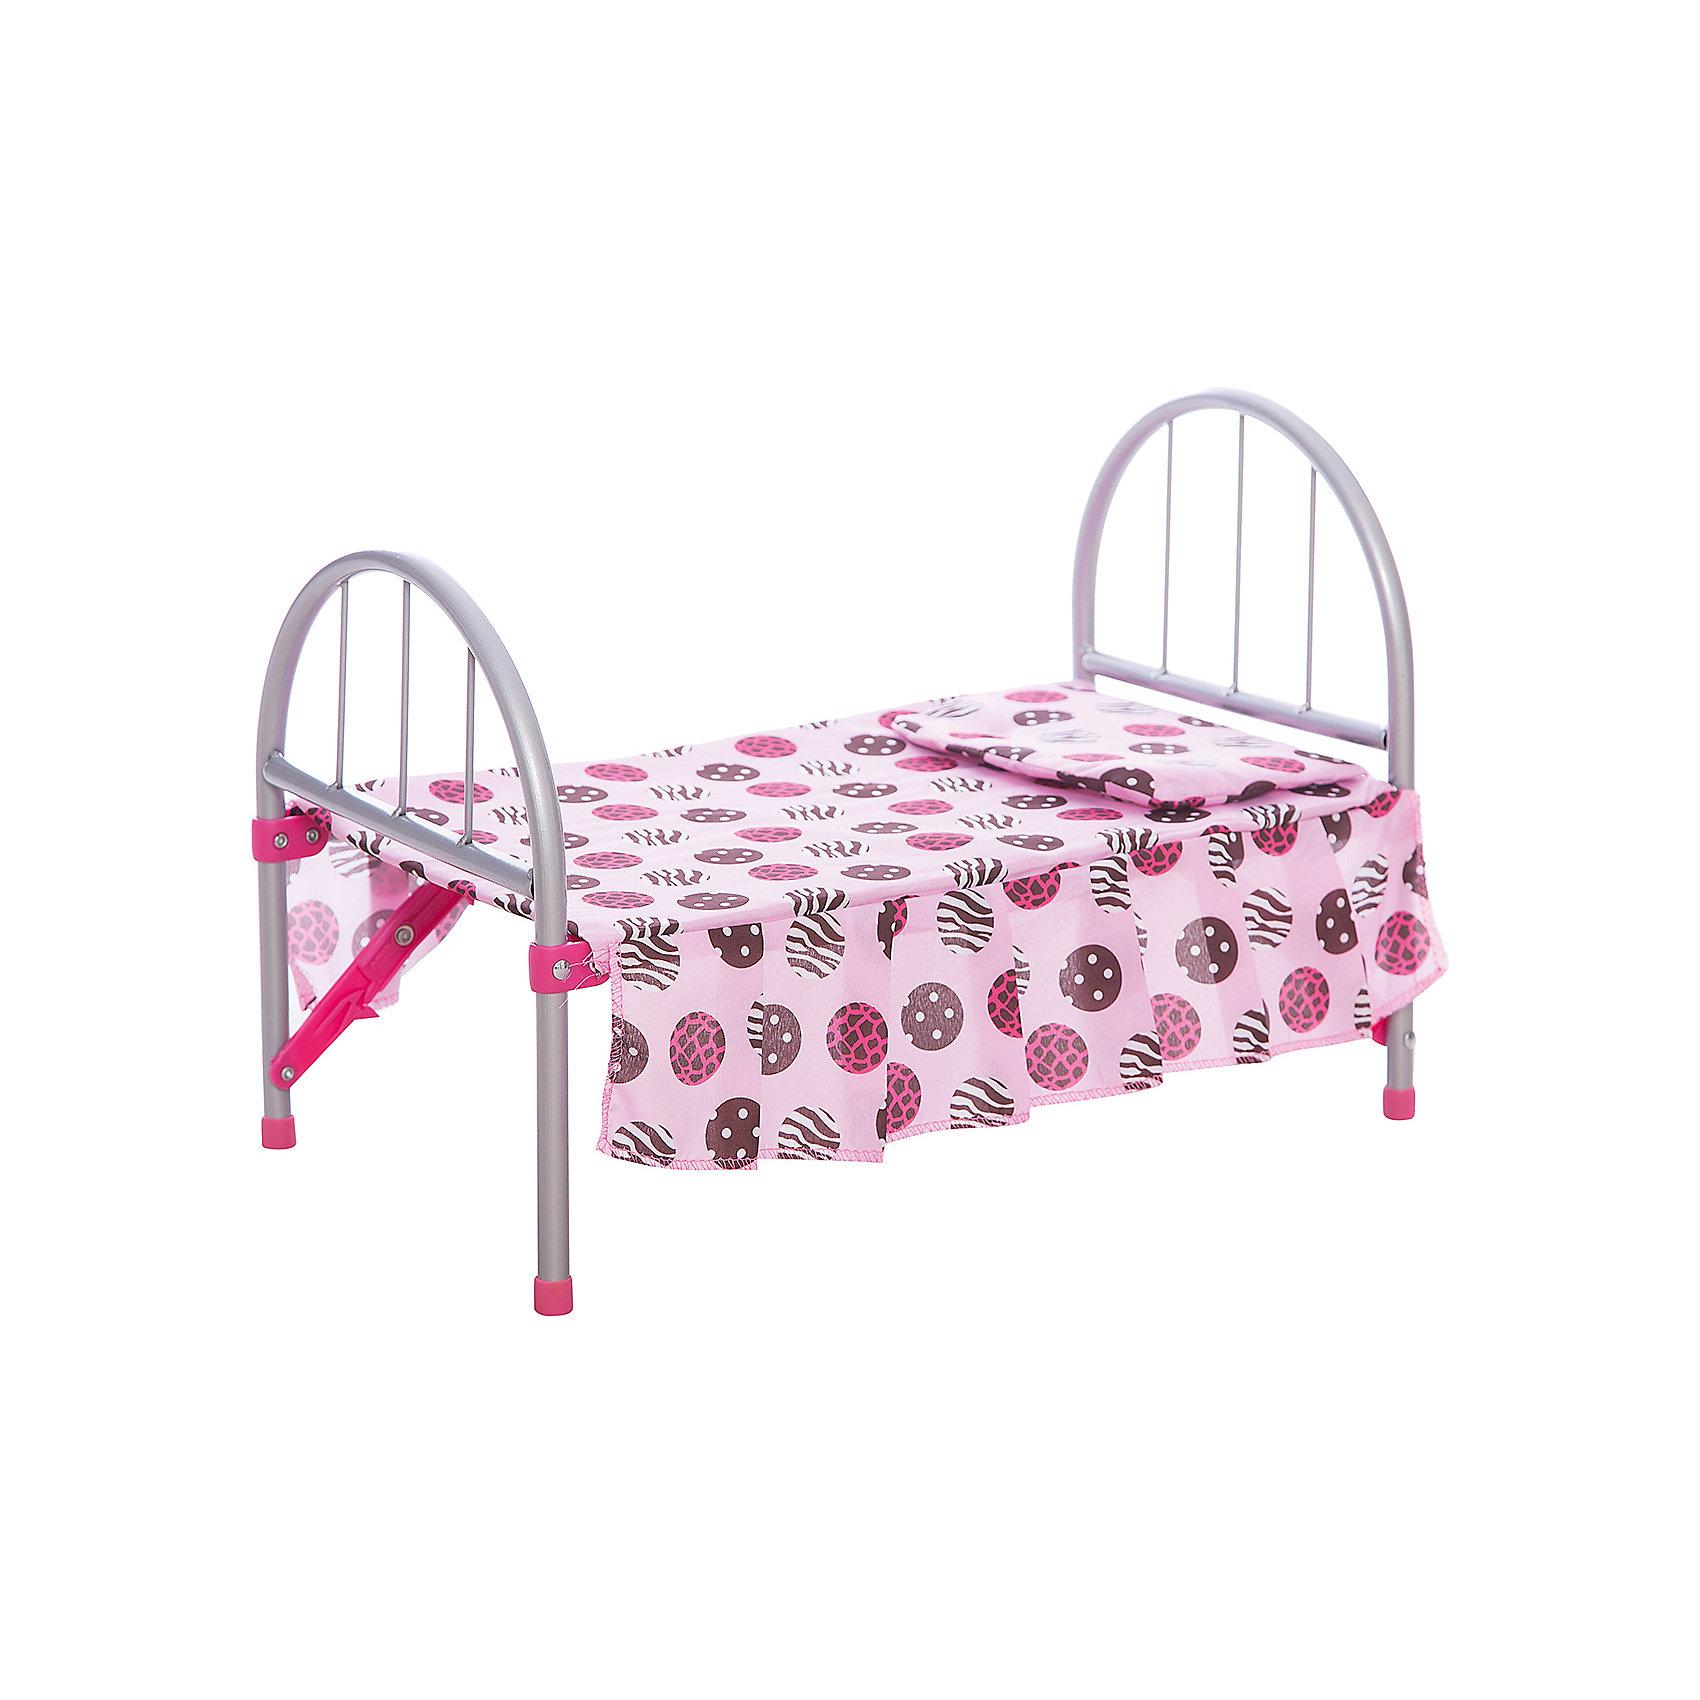 Кровать для кукол, Melobo<br><br>Ширина мм: 460<br>Глубина мм: 270<br>Высота мм: 100<br>Вес г: 900<br>Возраст от месяцев: 12<br>Возраст до месяцев: 60<br>Пол: Унисекс<br>Возраст: Детский<br>SKU: 5234880